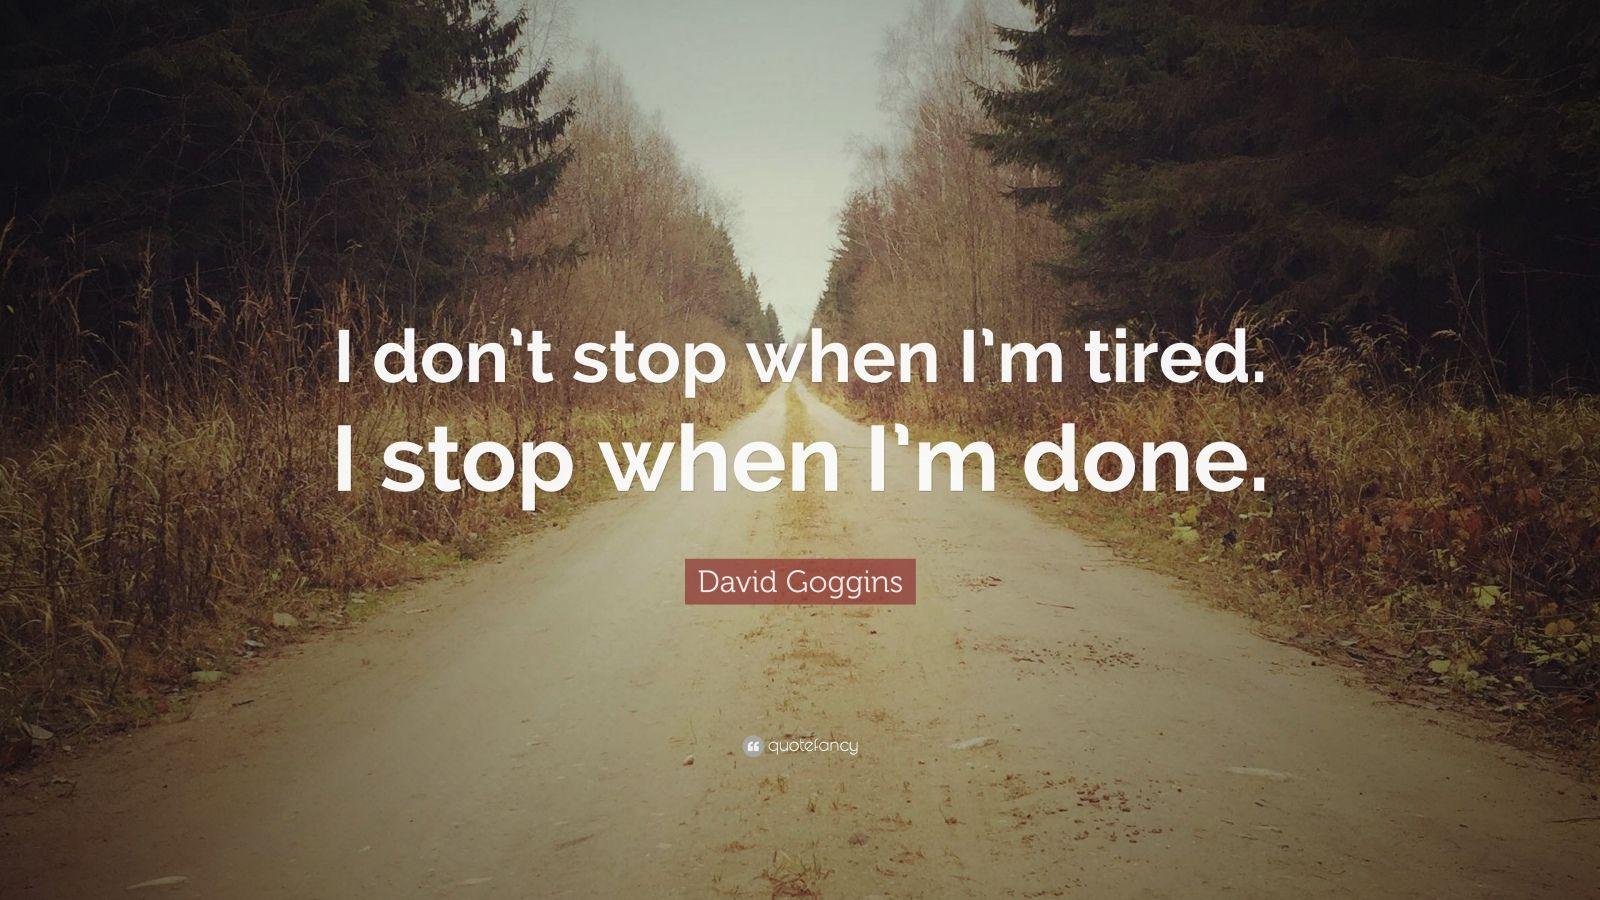 David Goggins Quotes (5 Wallpapers)